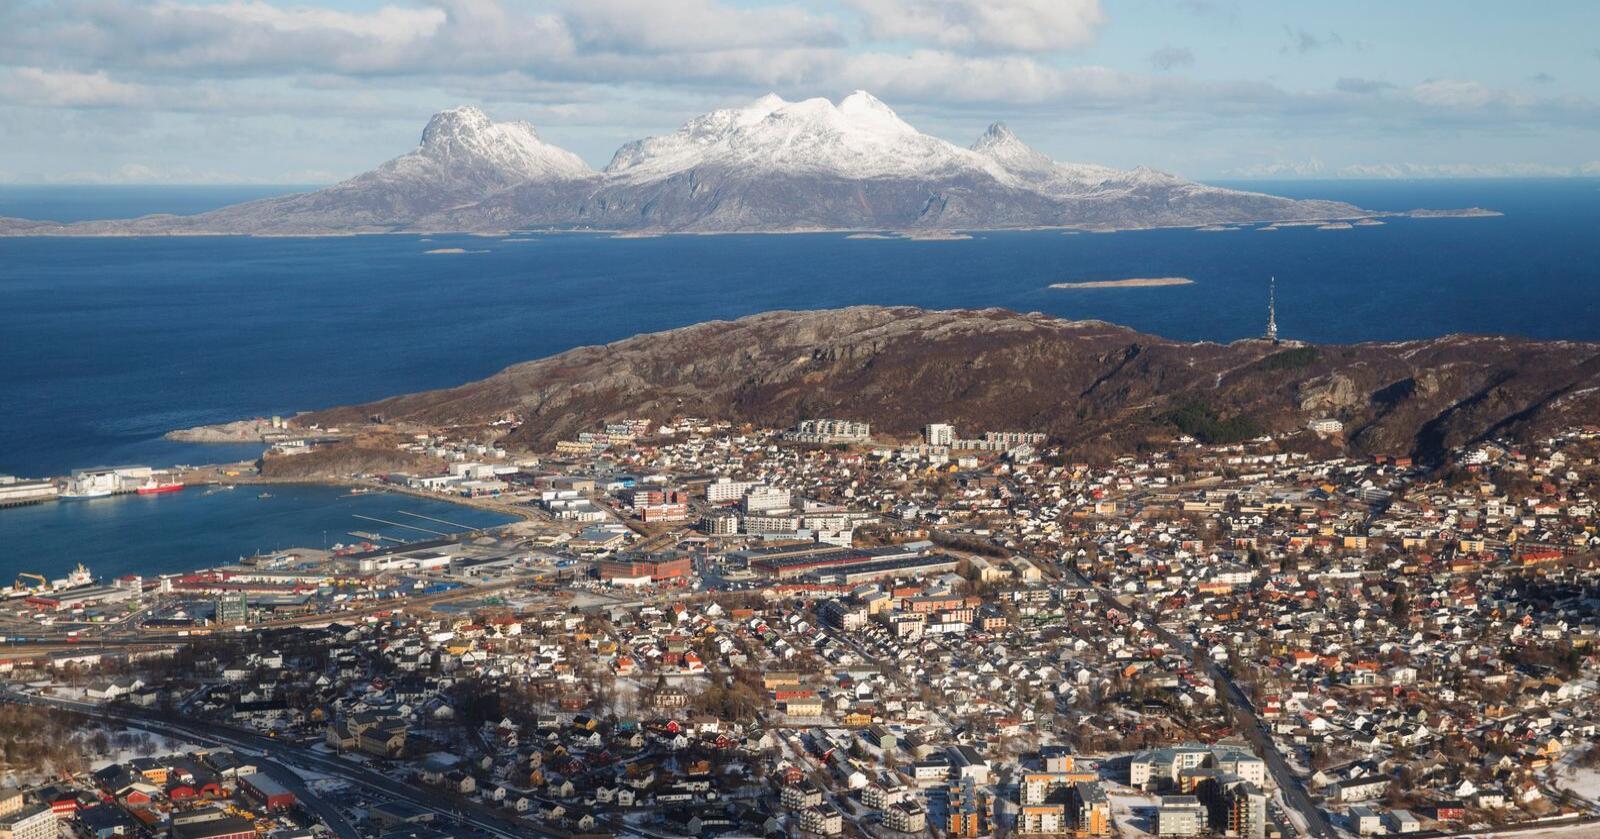 Fylkesrådsleder i Nordland, Tomas Norvoll (Ap), vil åpne barnehager og lave skoletrinn. Her fra Bodø. Foto: Håkon Mosvold Larsen / NTB scanpix